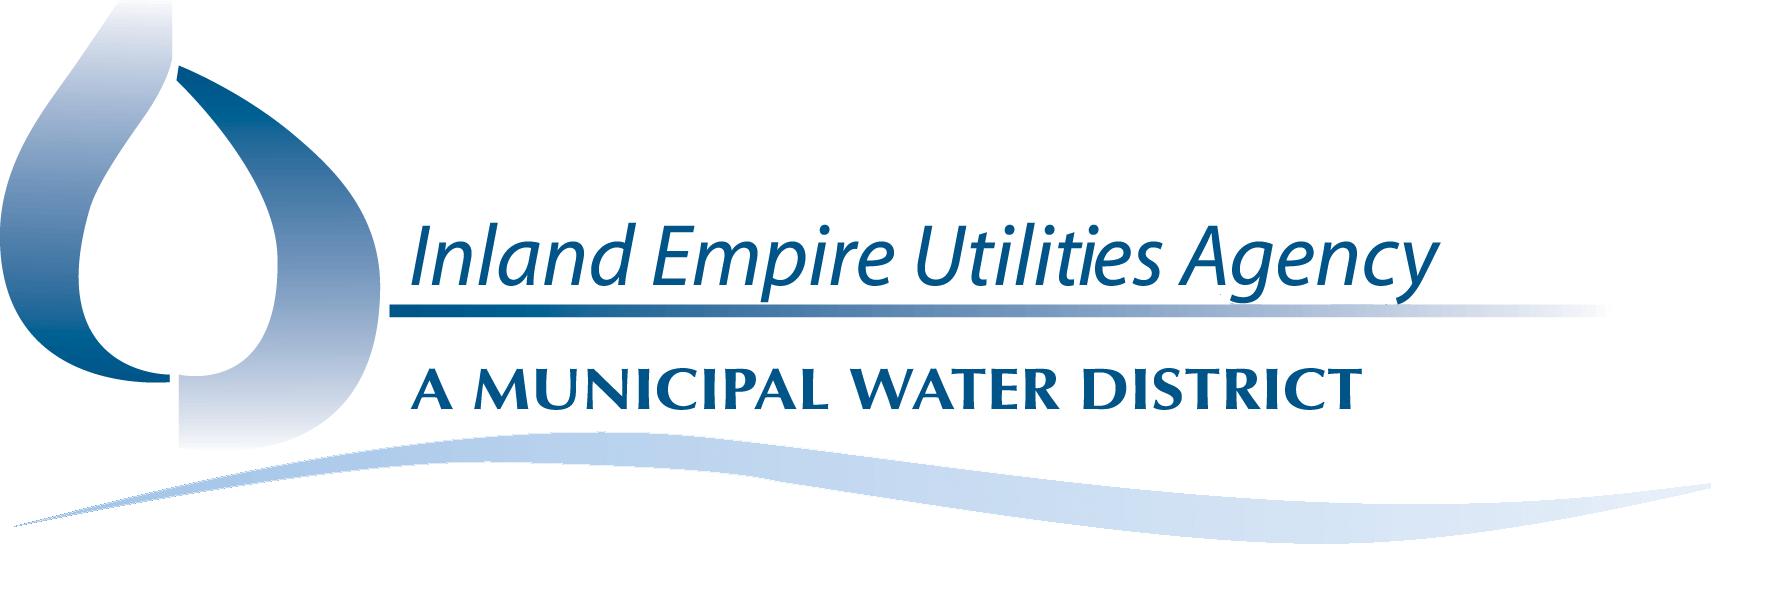 Inland Empire Utilities Agency Cake Climate Adaptation